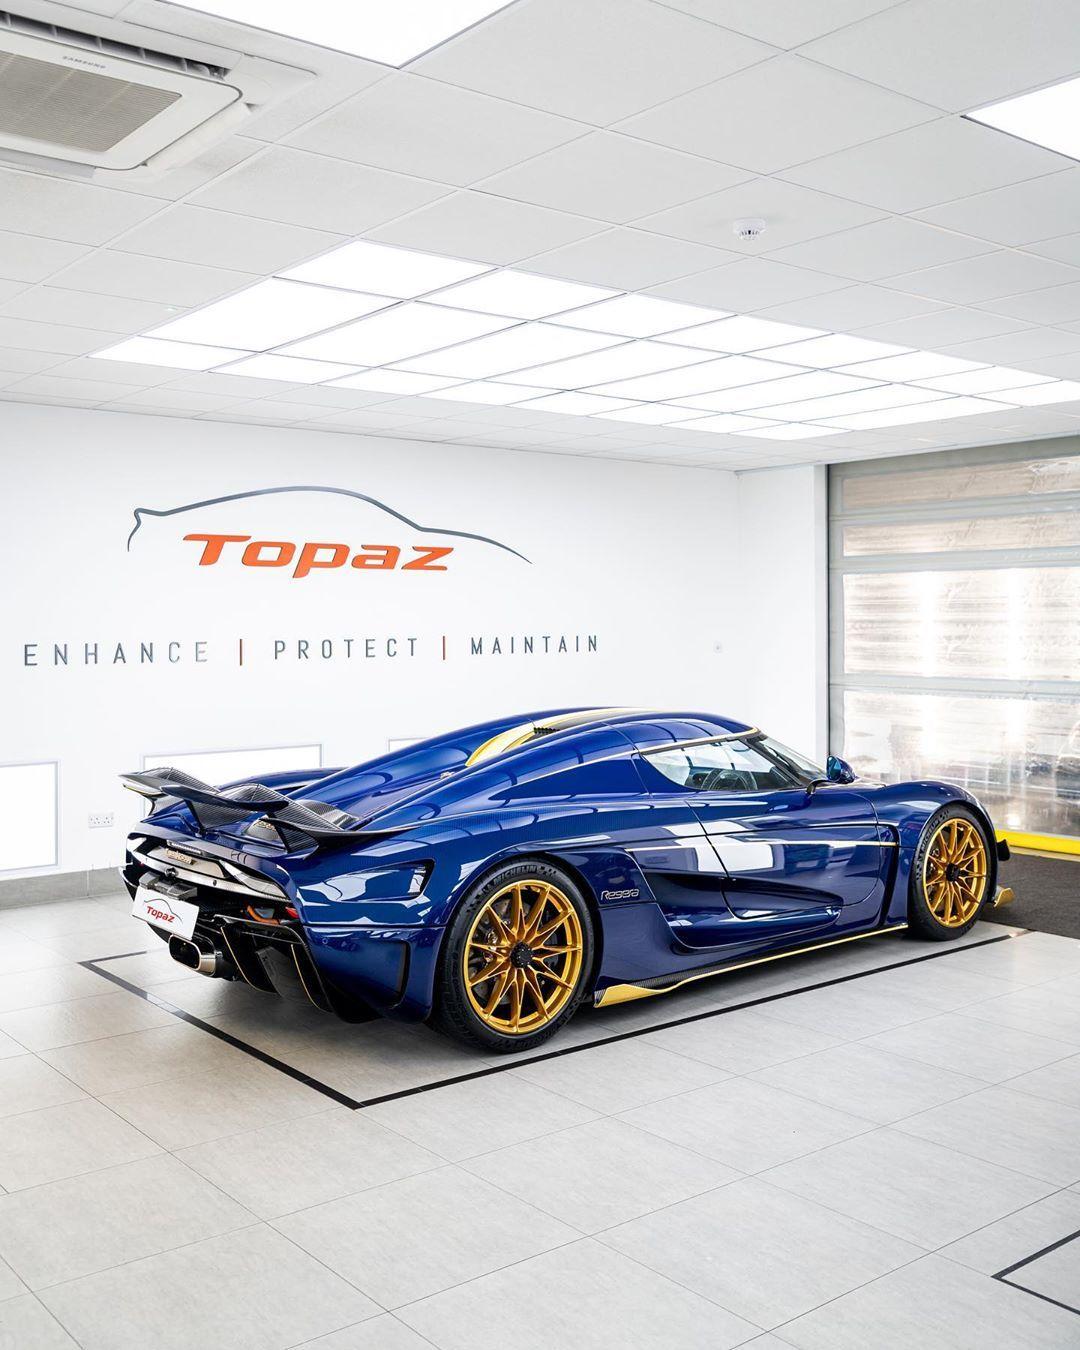 "Topaz Detailing on Instagram: ""@zachs_garage's stunning Koenigsegg Regera, fully protected to the highest standard 💙 #Koenigsegg #Regera #TopazDetailing #PPF #London"""